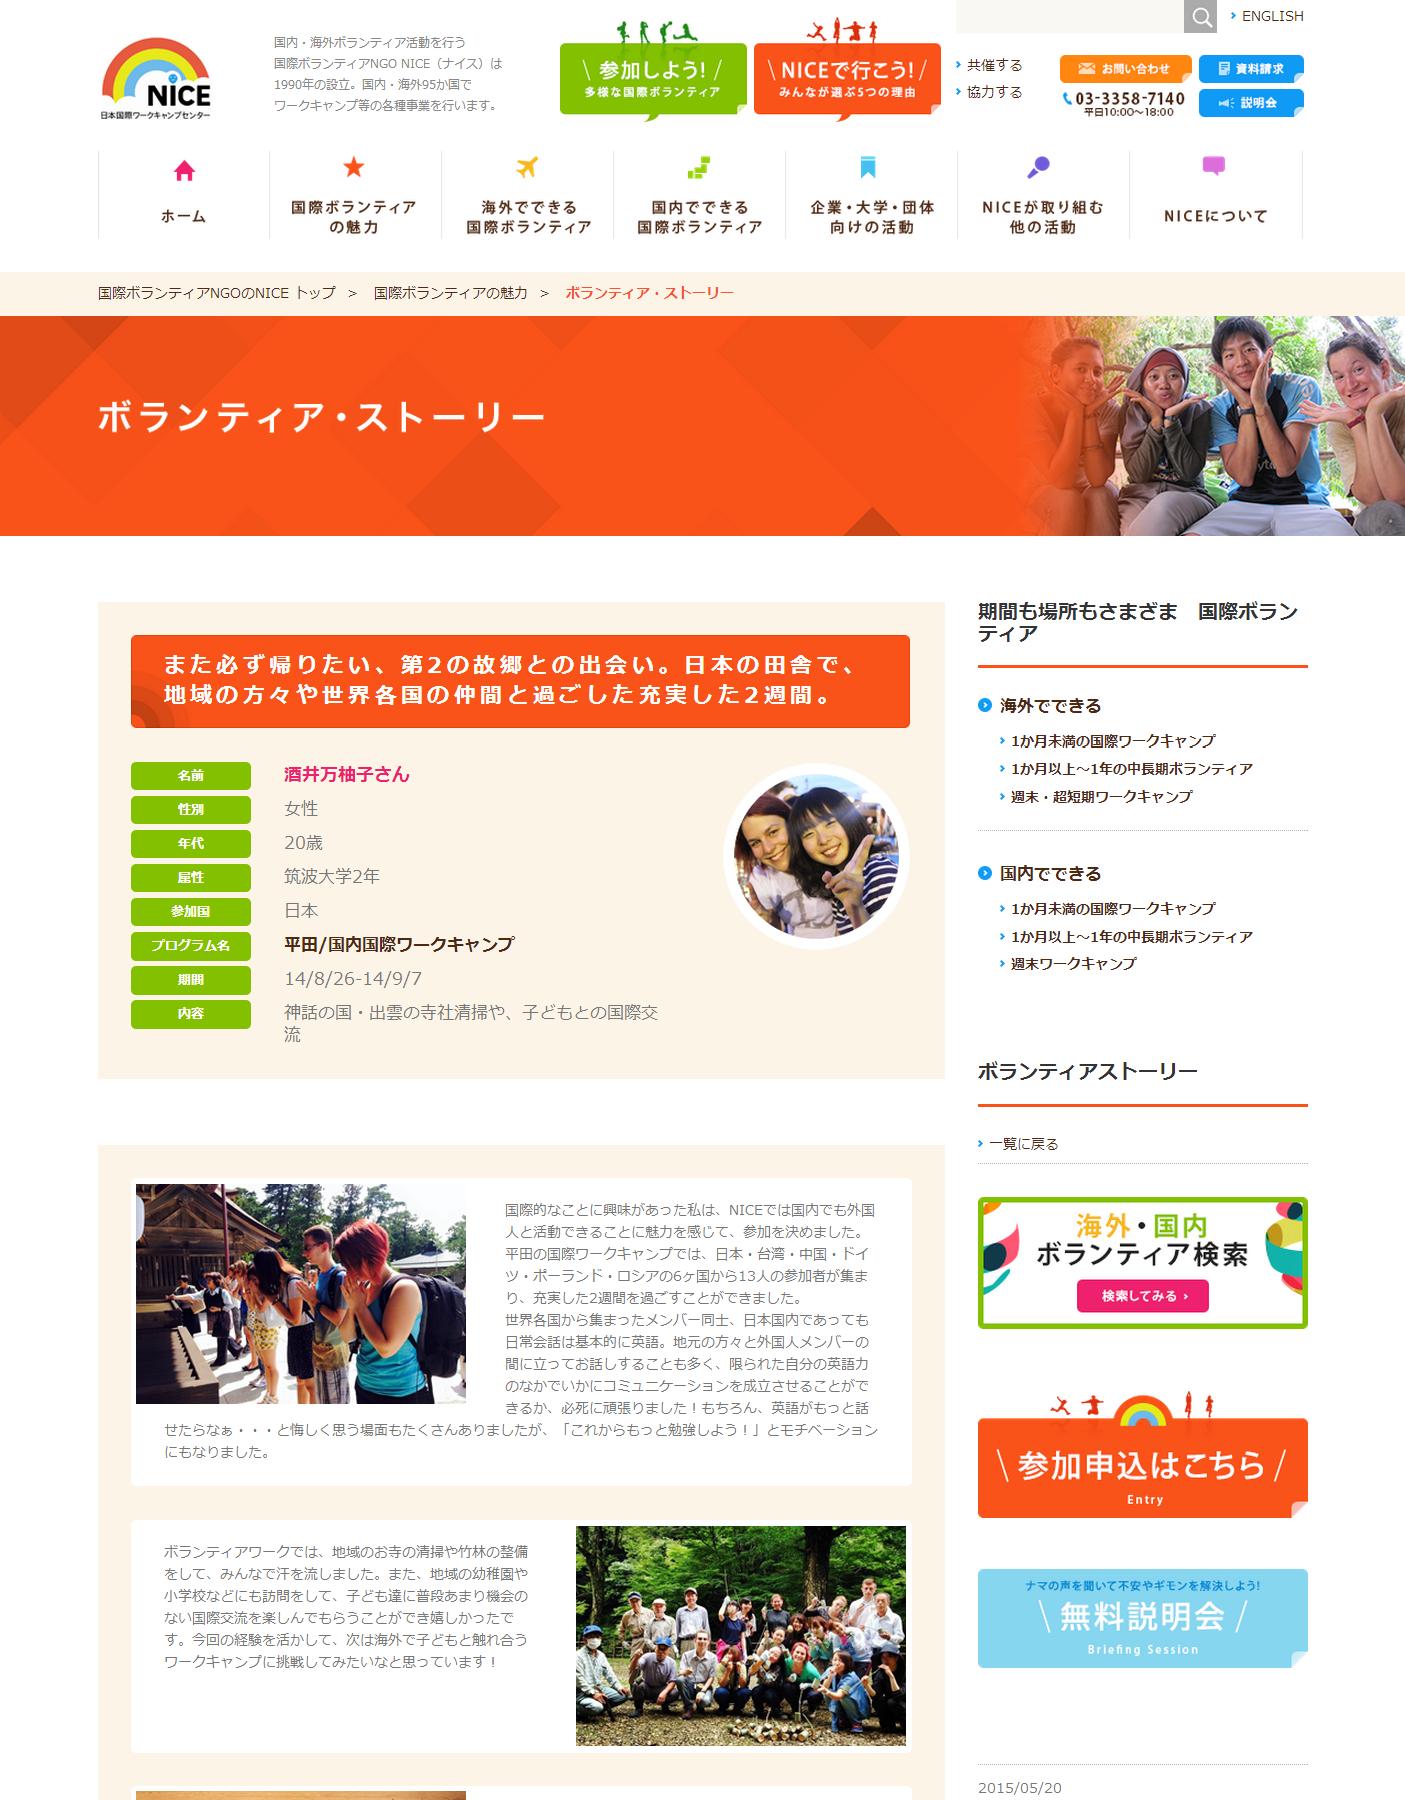 http://www.ark-web.jp/blog/images/nice03.png